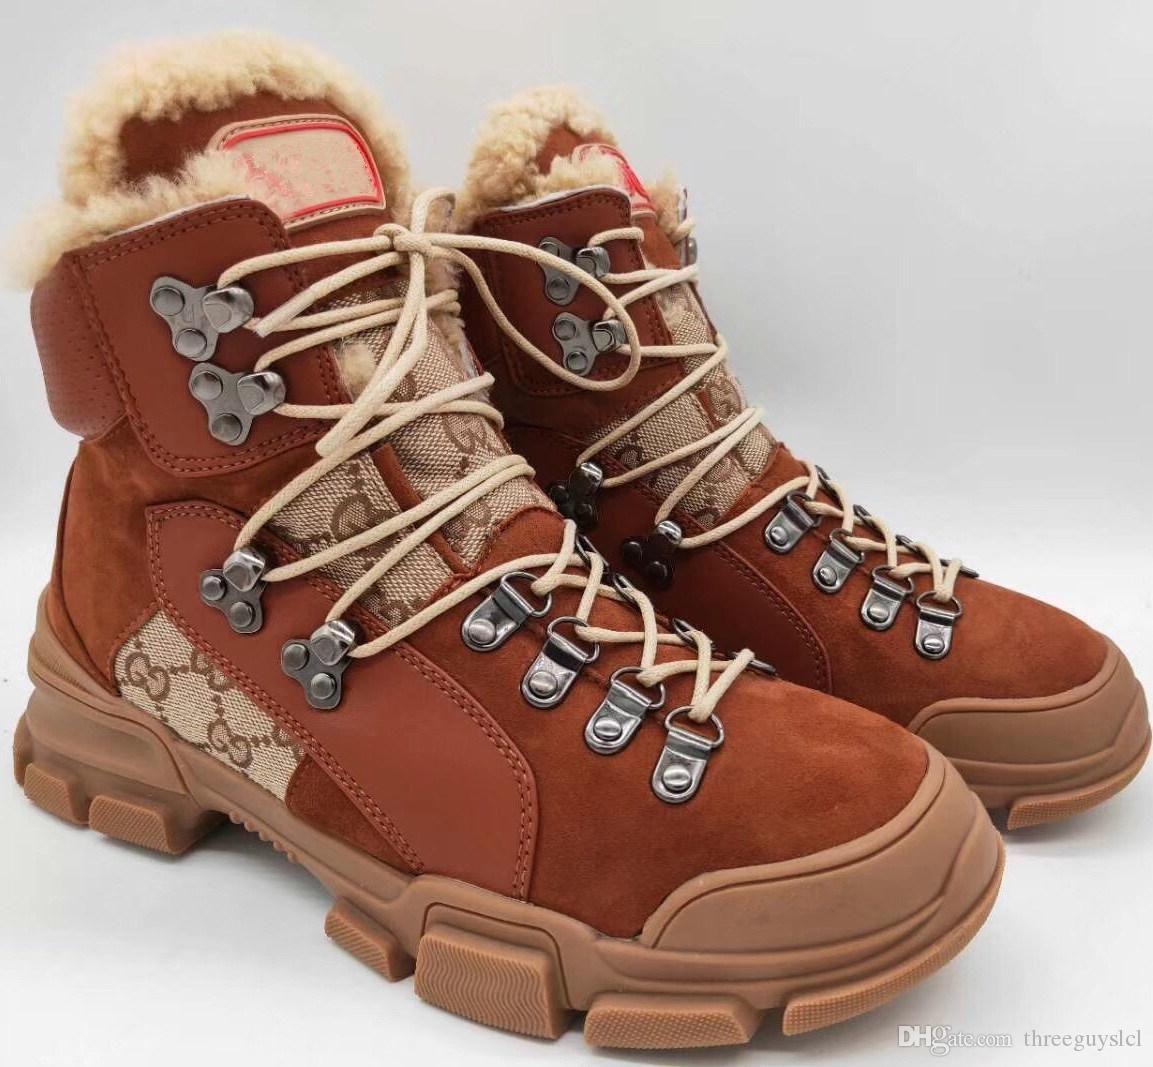 Acquista Flashtrek High Top Sneaker Mens Luxury Brand Designer Scarpe Da  Donna In Pelle Da Montagna Arrampicata Da Trekking Stivali Di Alta Qualità  Moda ... 9ec92bef6e5